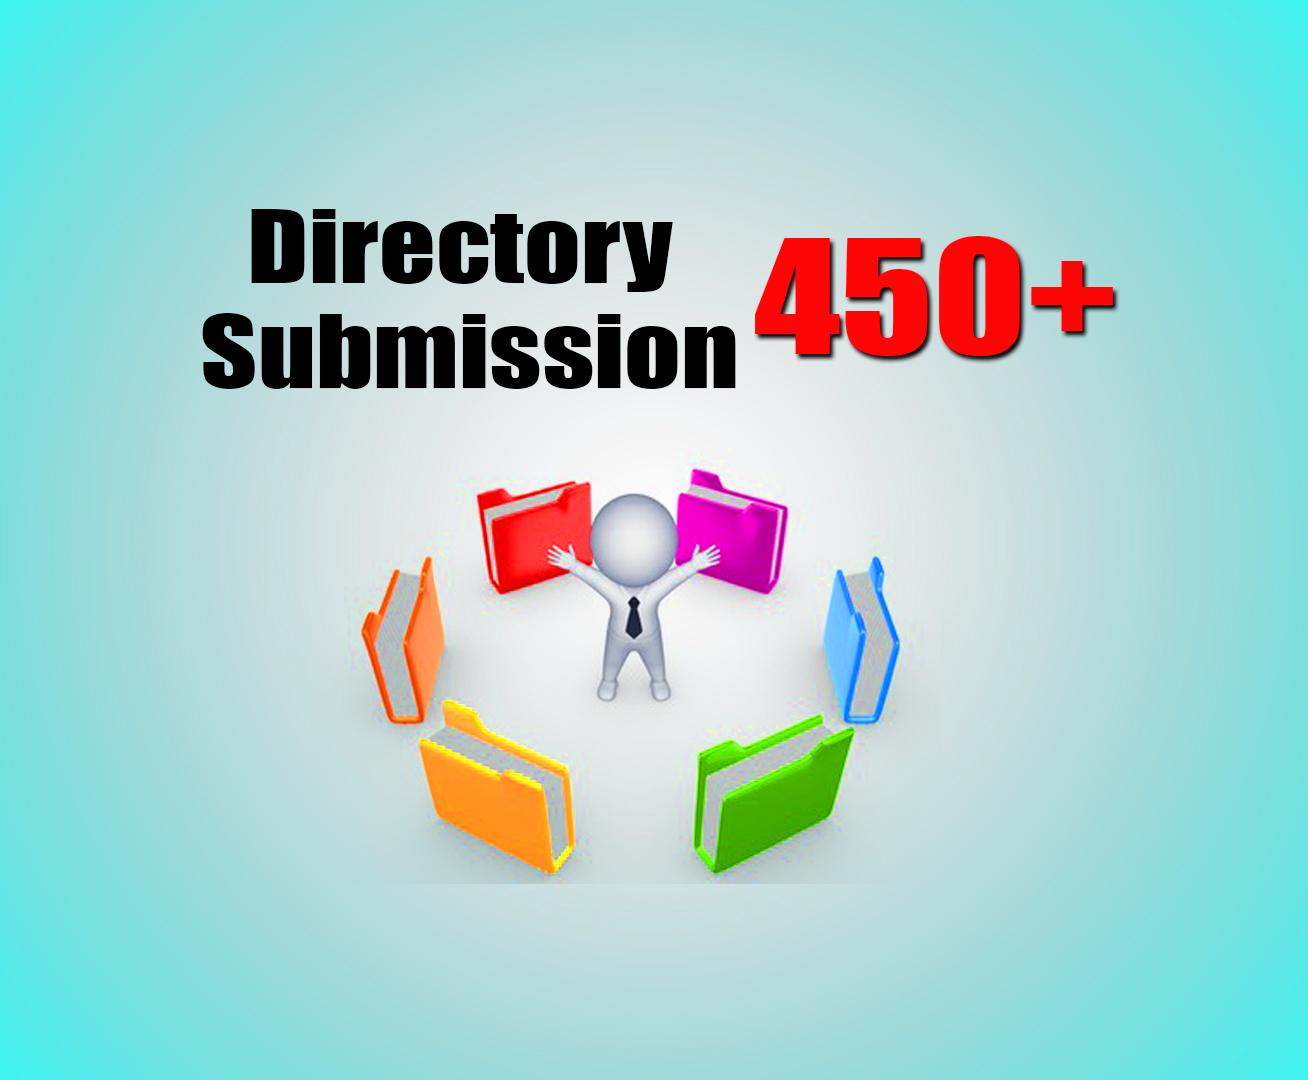 450+ Directories in just 2 Hours